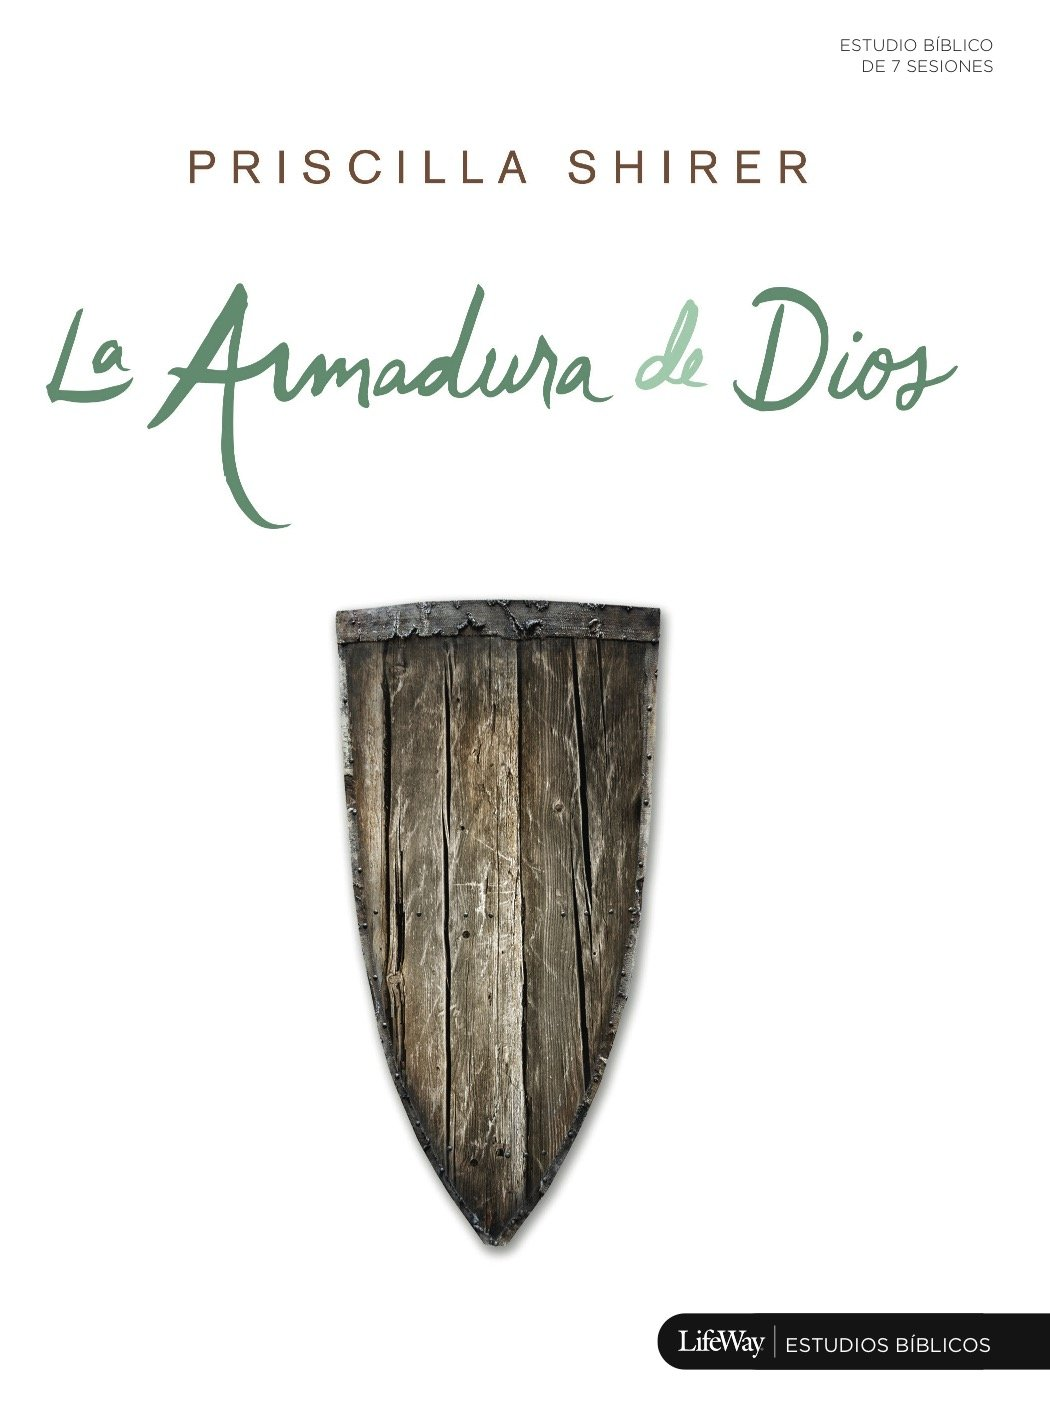 Armadura Dios Spanish Priscilla Shirer